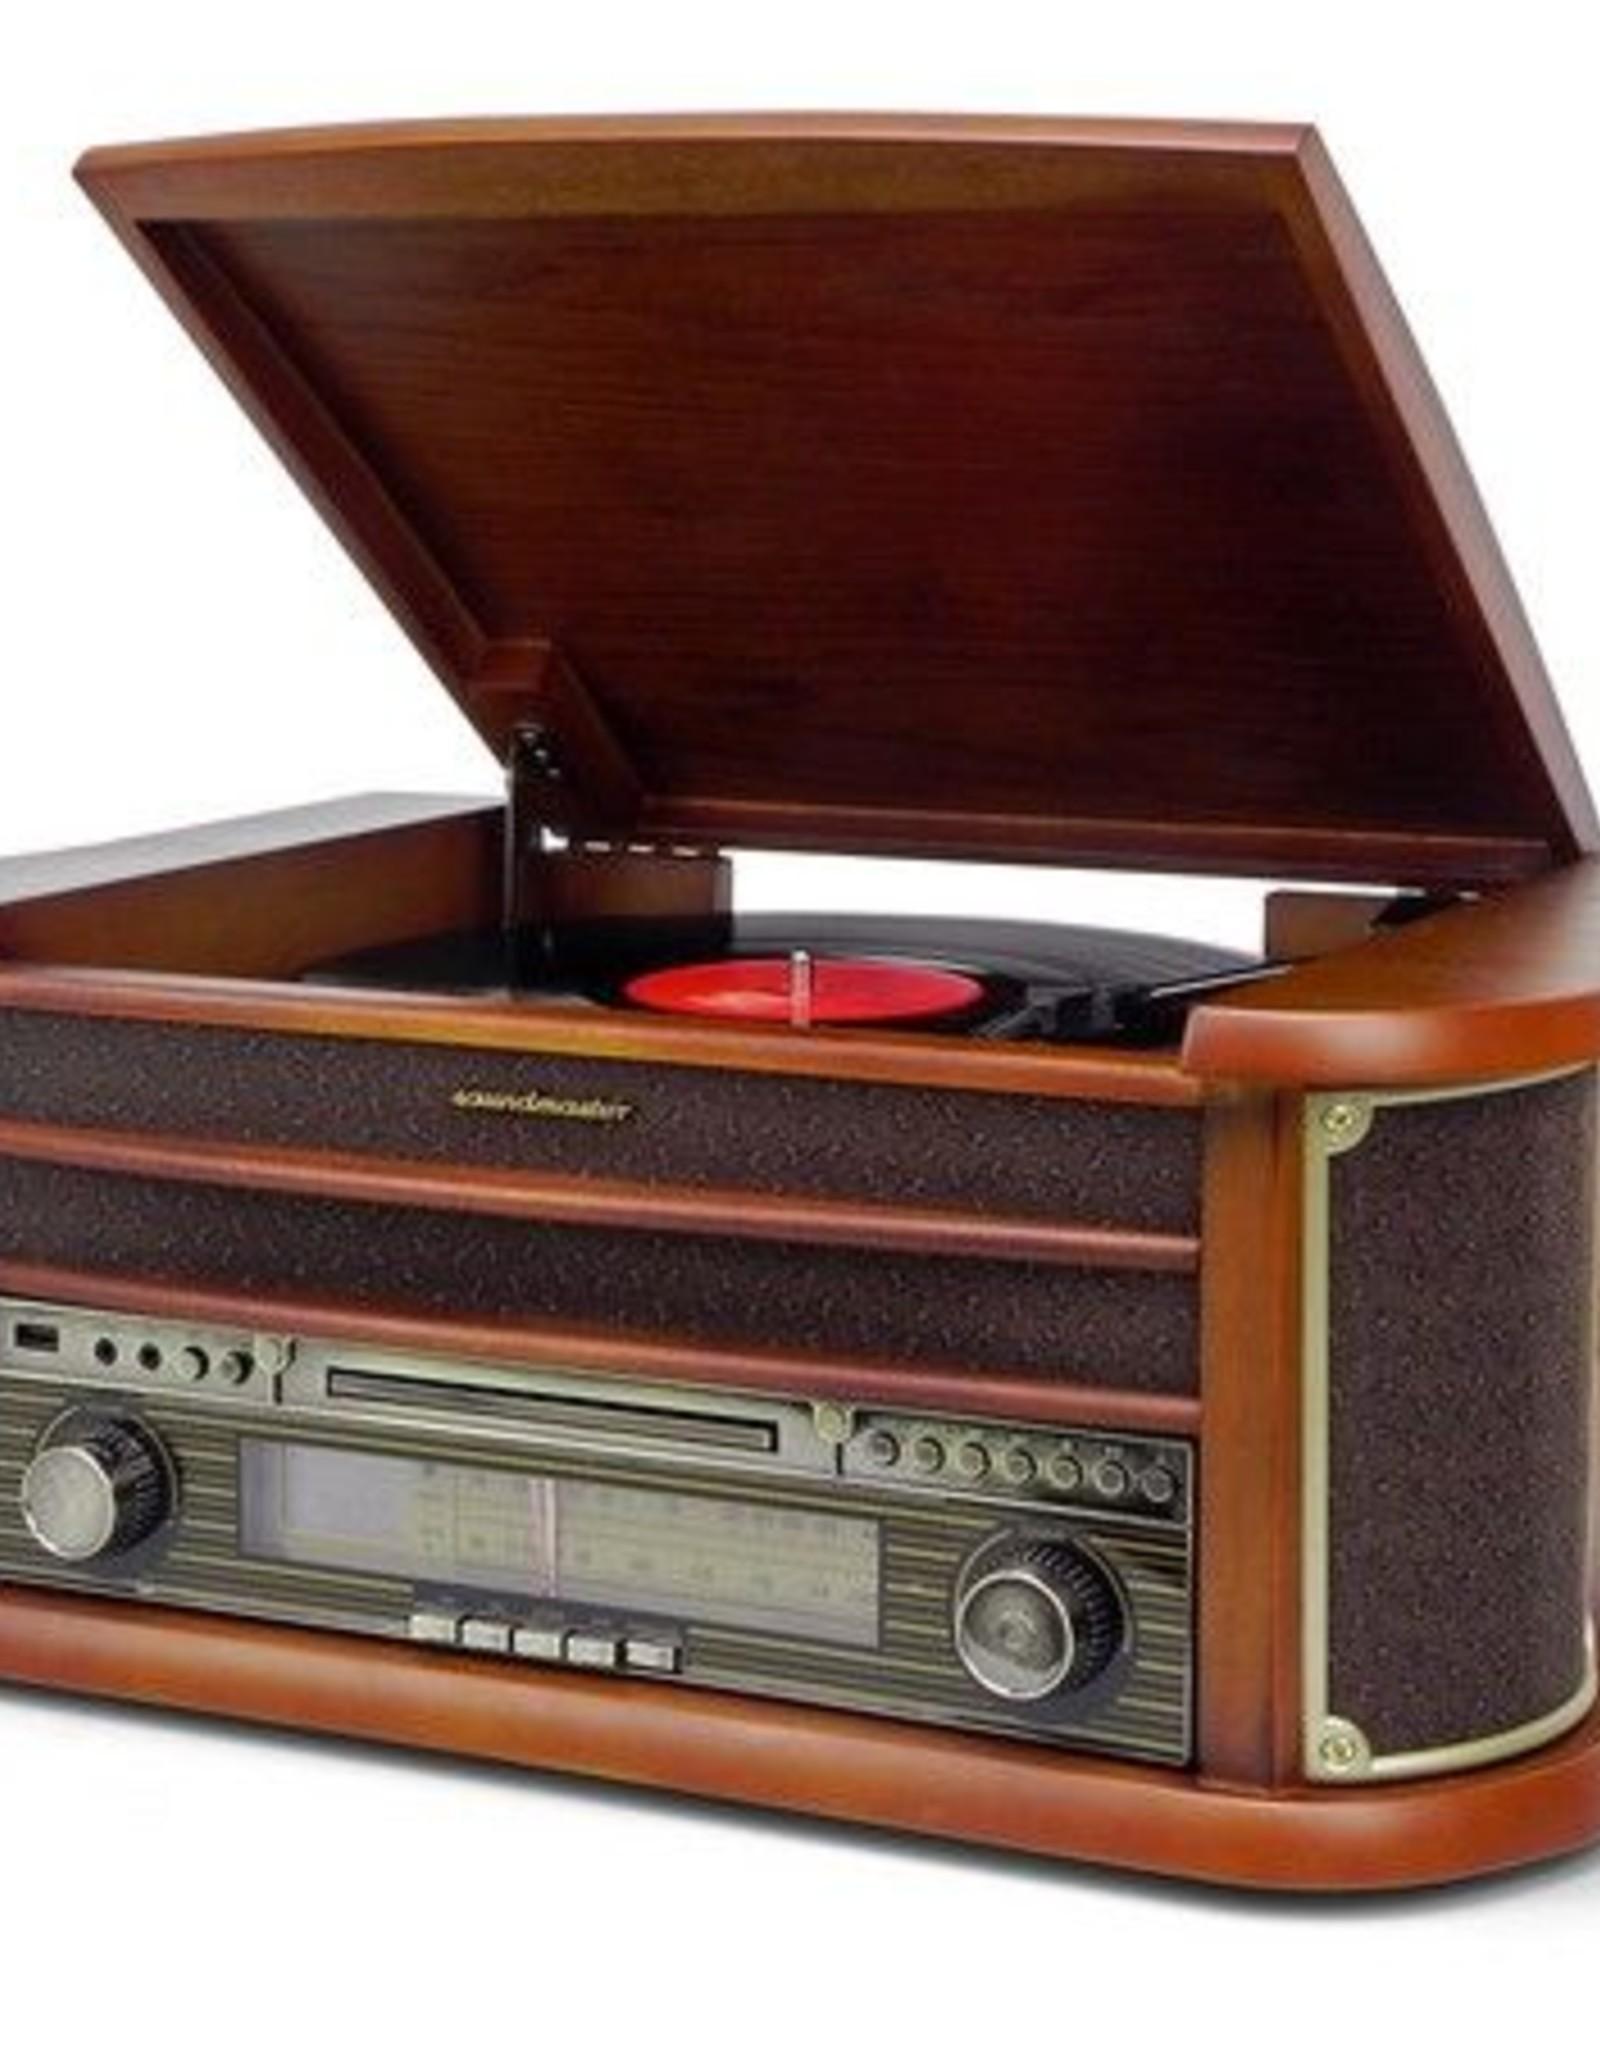 Soundmaster Nostalgisch music center NR540